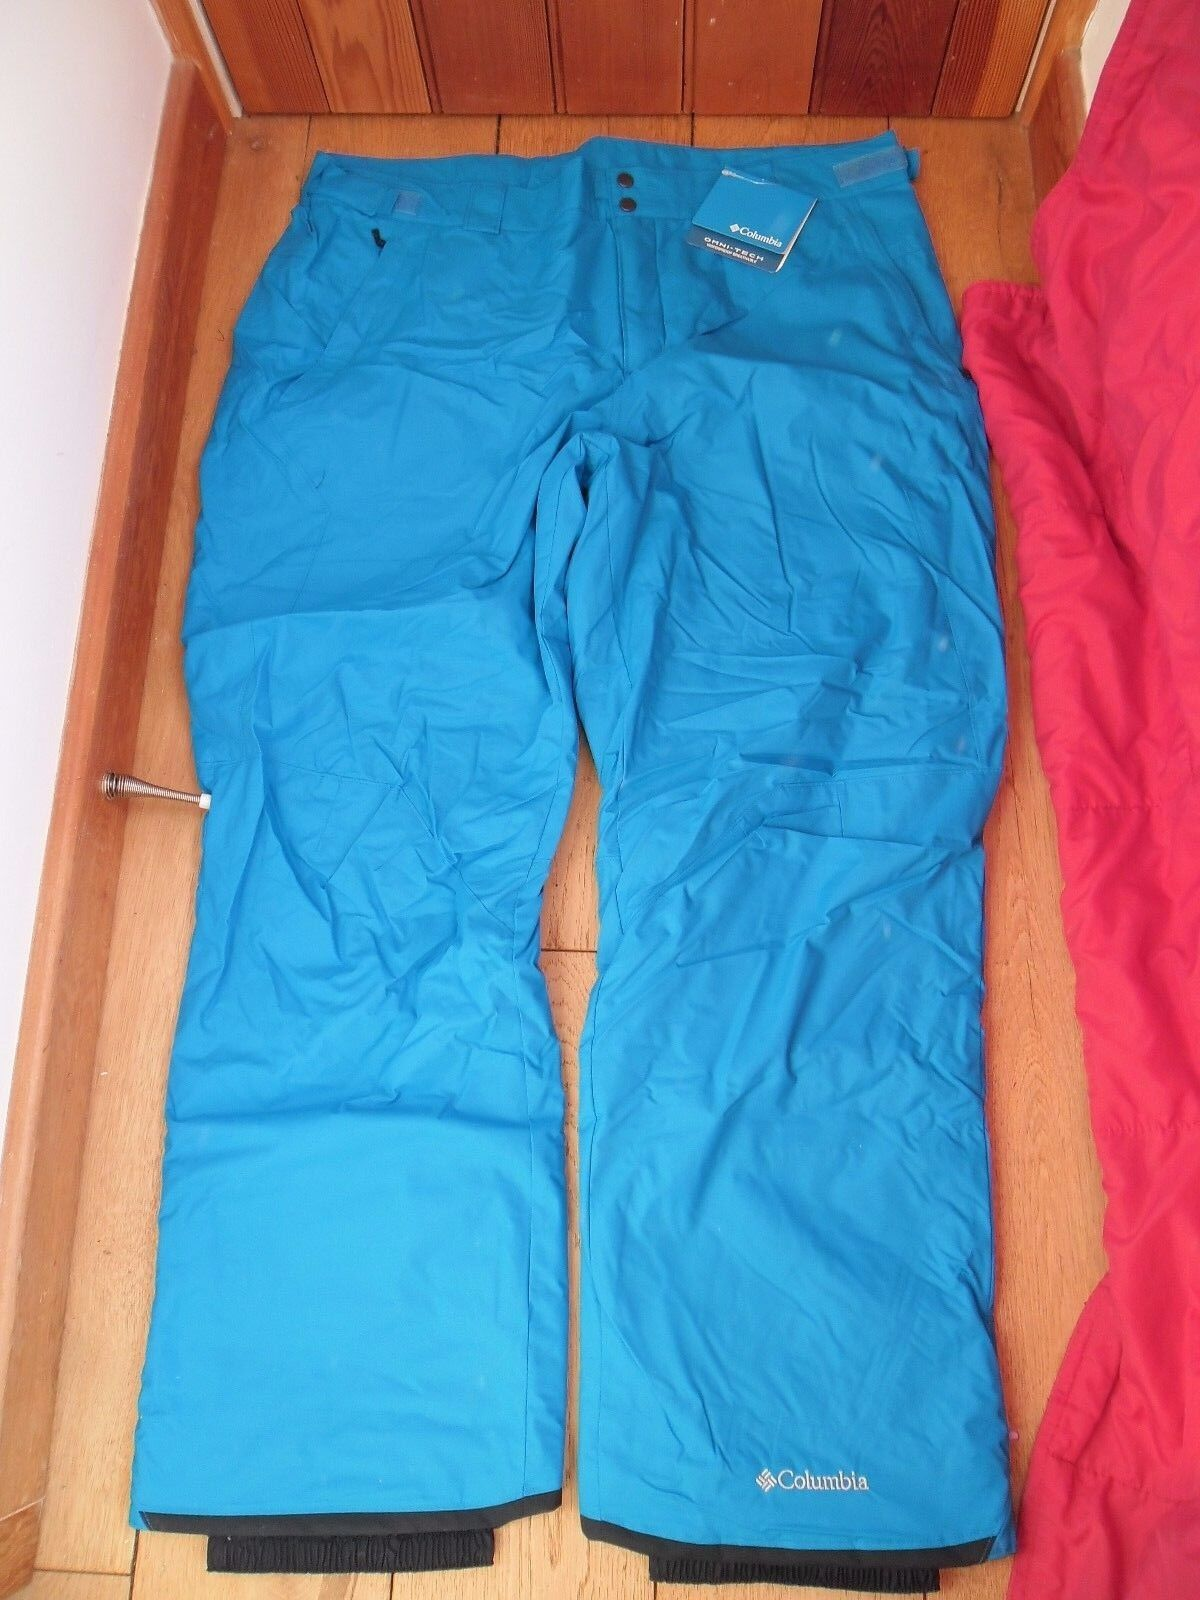 COLUMBIA TECH BRIGHT Blau OMNI TECH COLUMBIA WATERPROOF BREATHABLE THERMAL SKI BOARD PANTS XXL c77e54